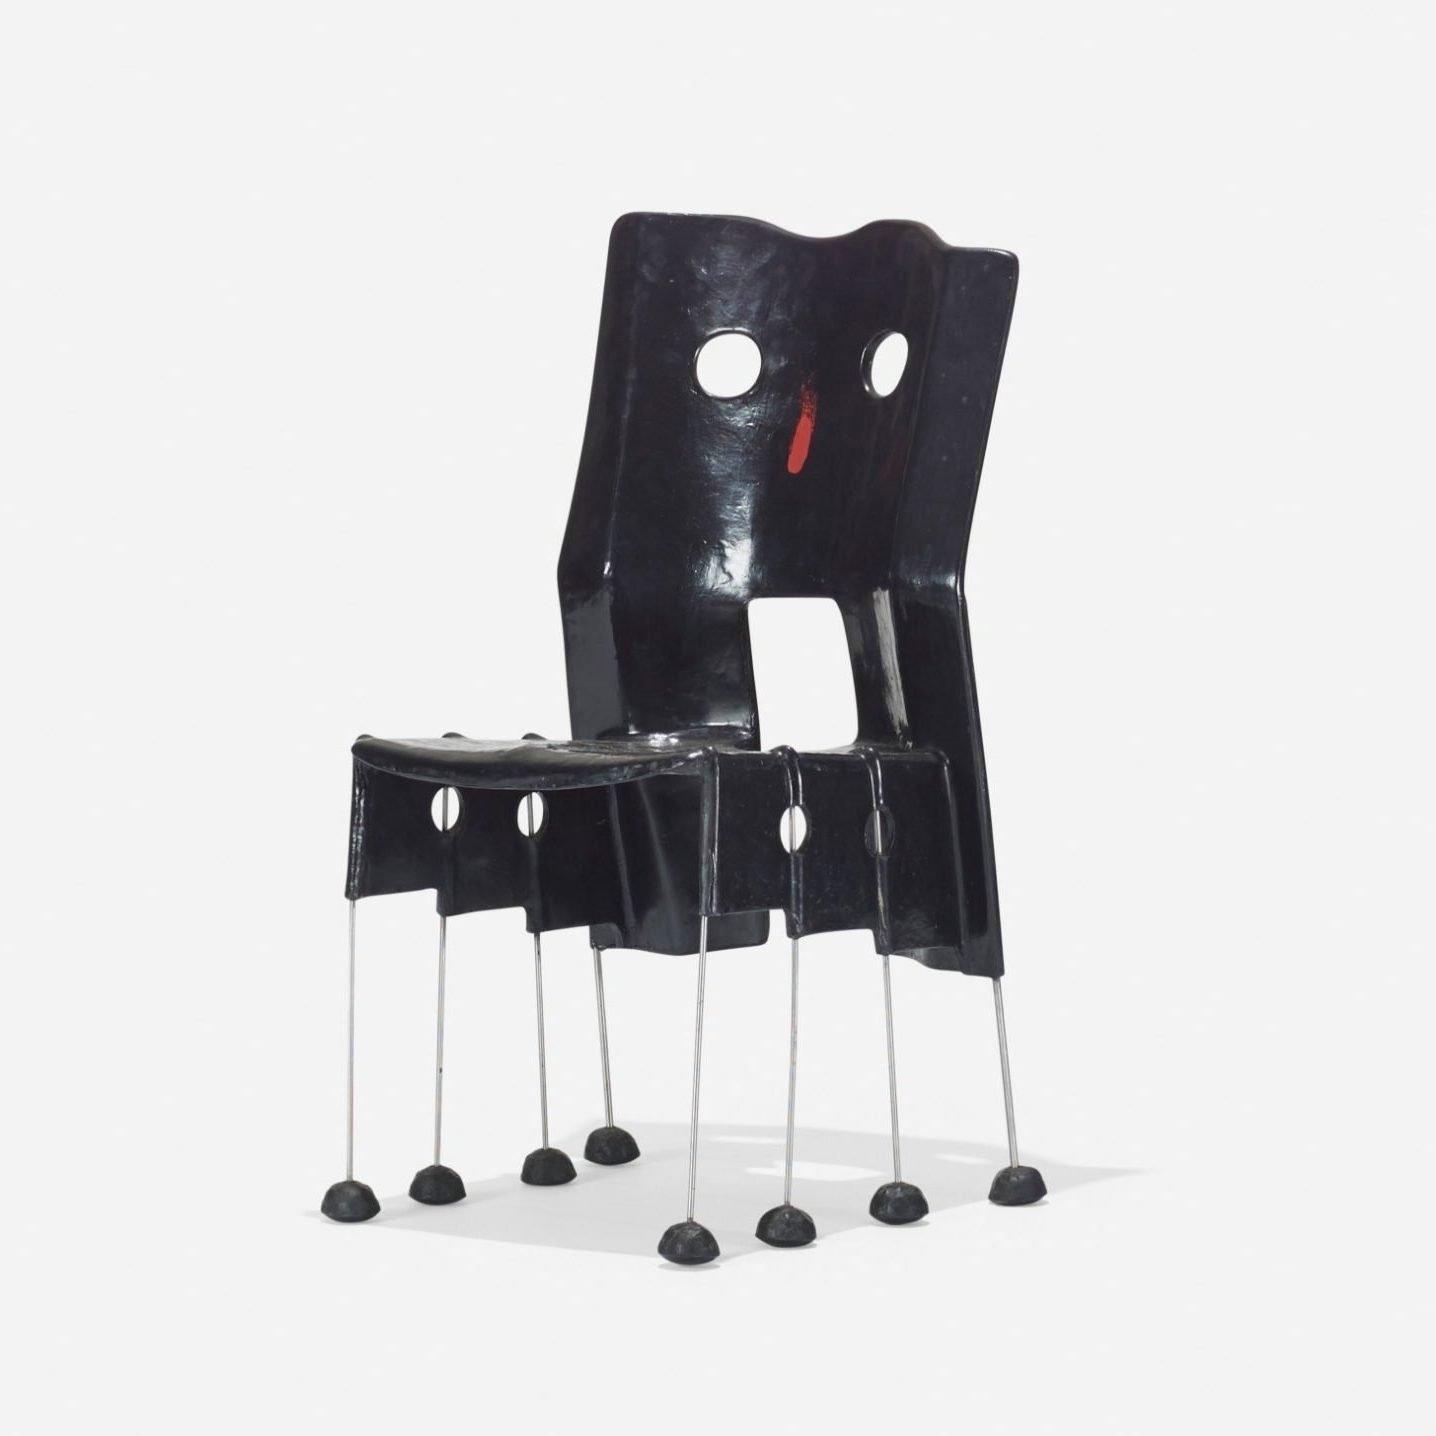 Vitra chair by Italian designer Gaetano Pesce copy